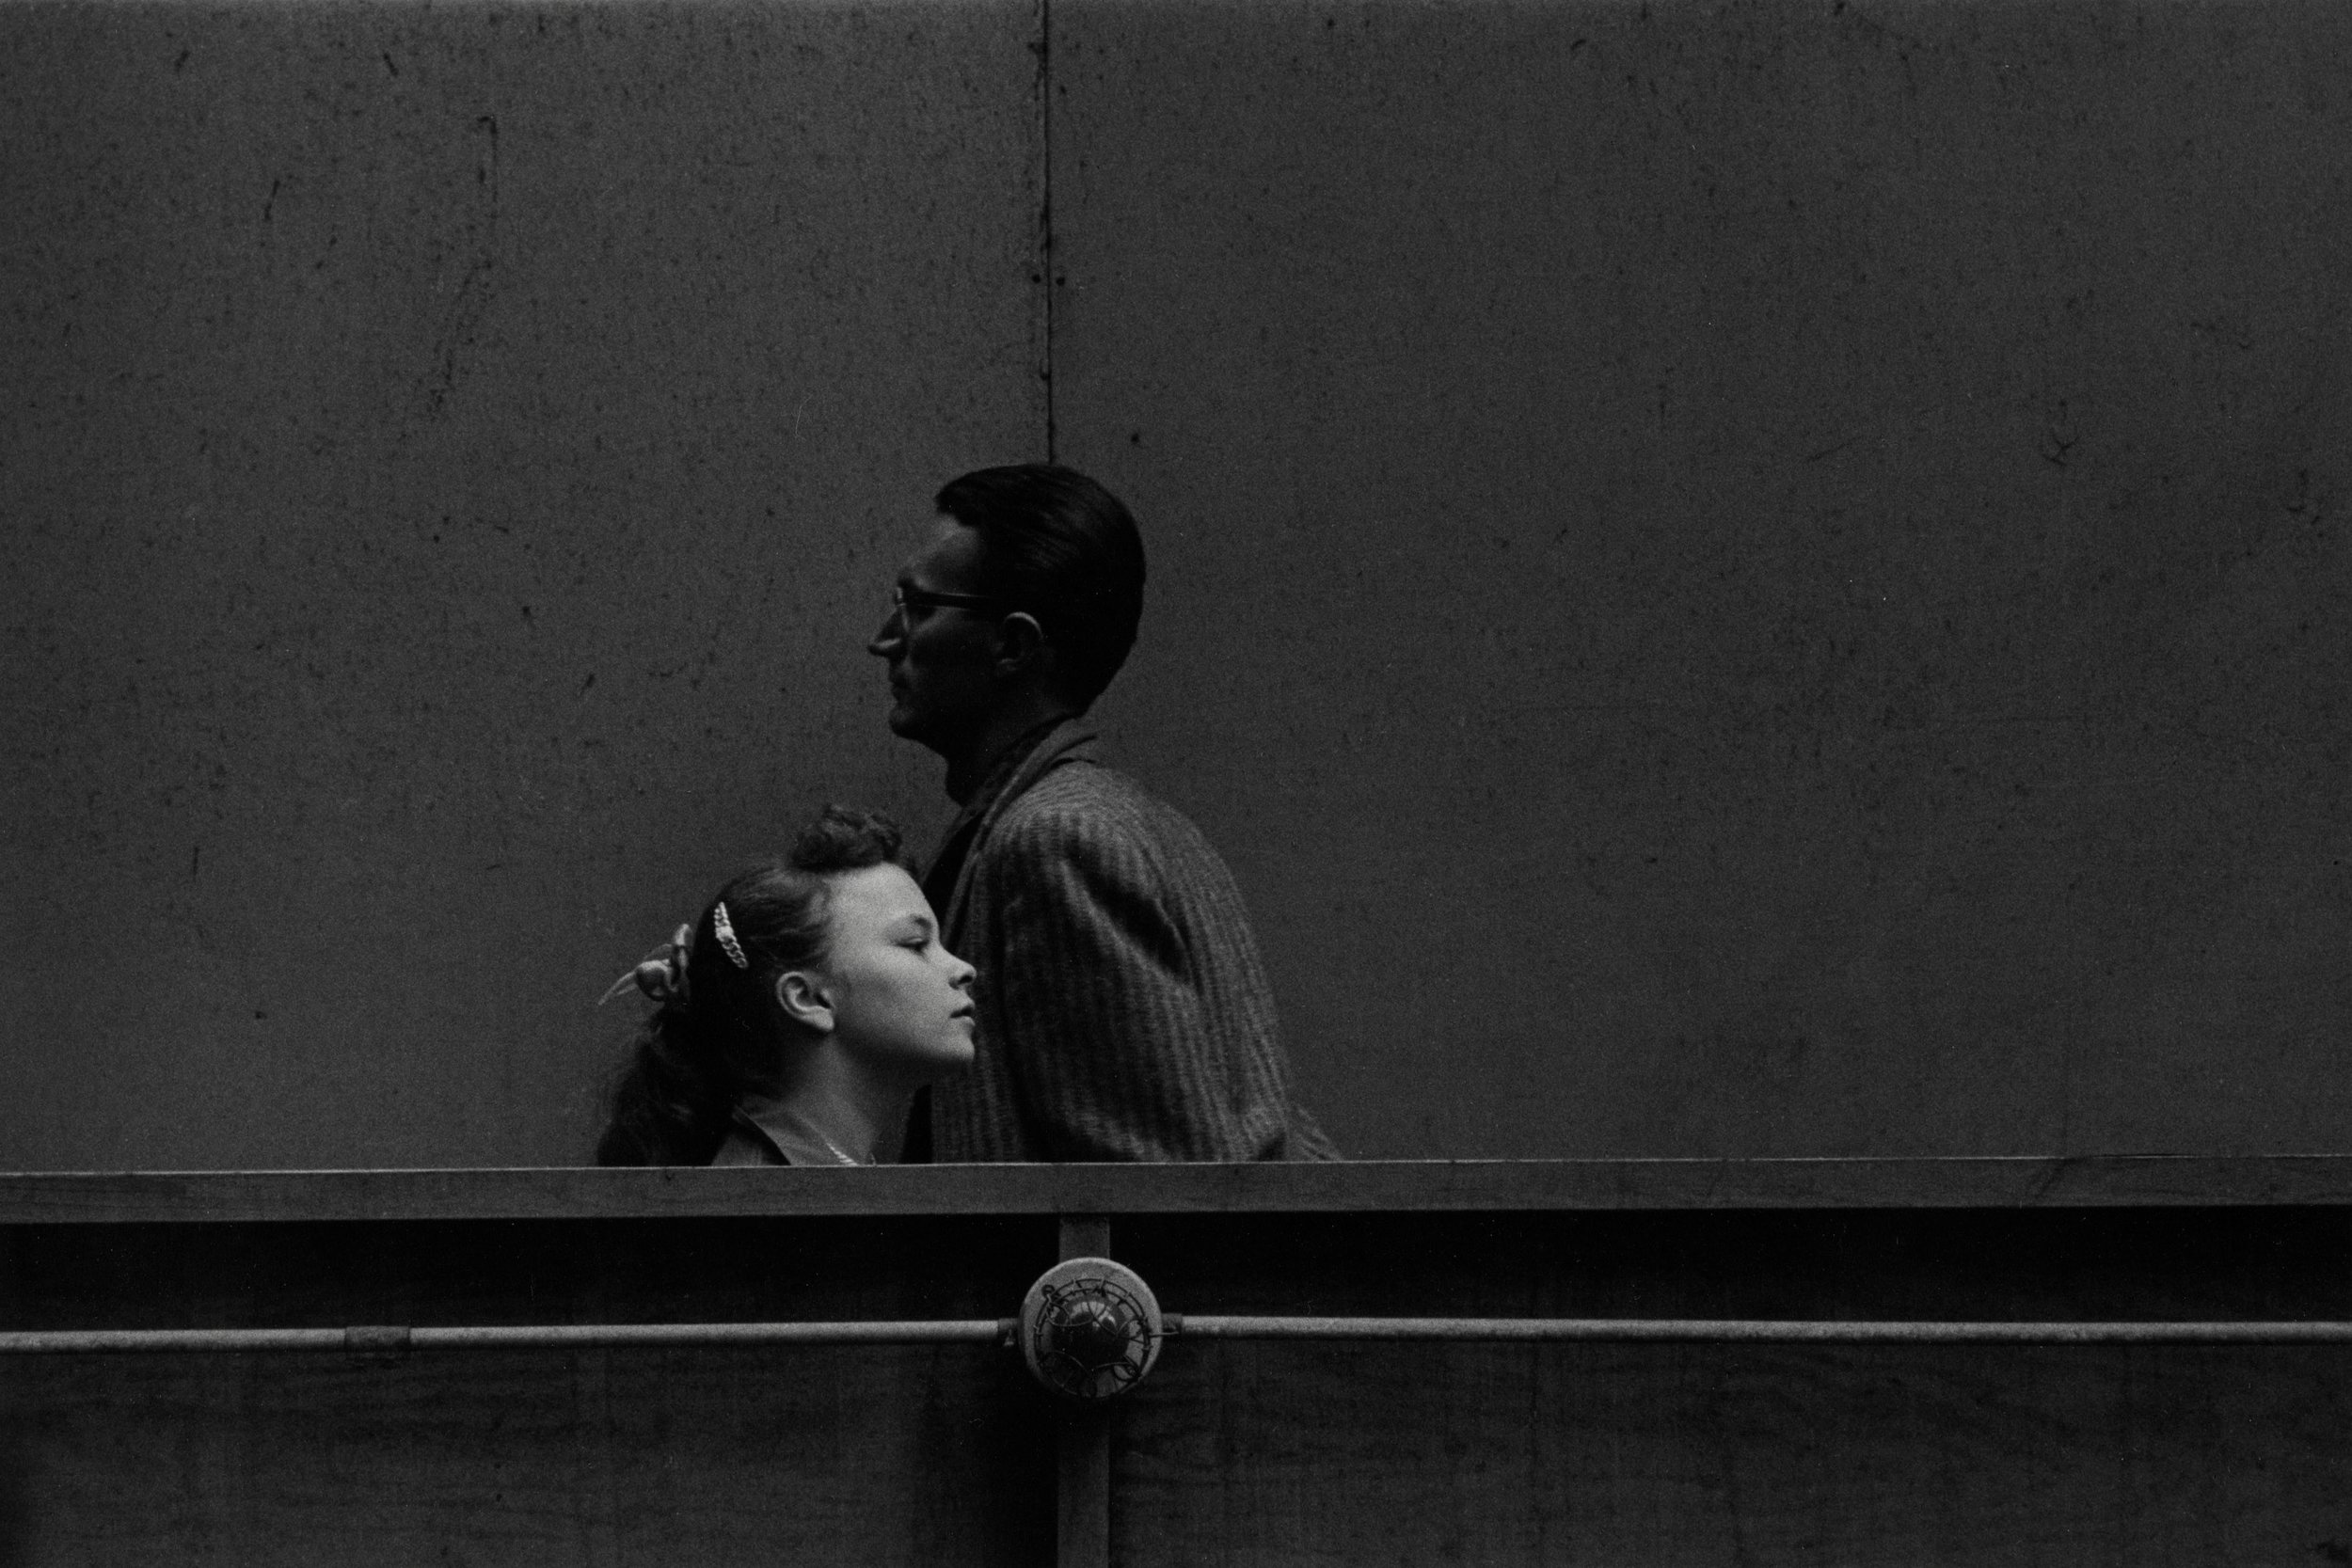 Callihan_Chicago 1960.jpg